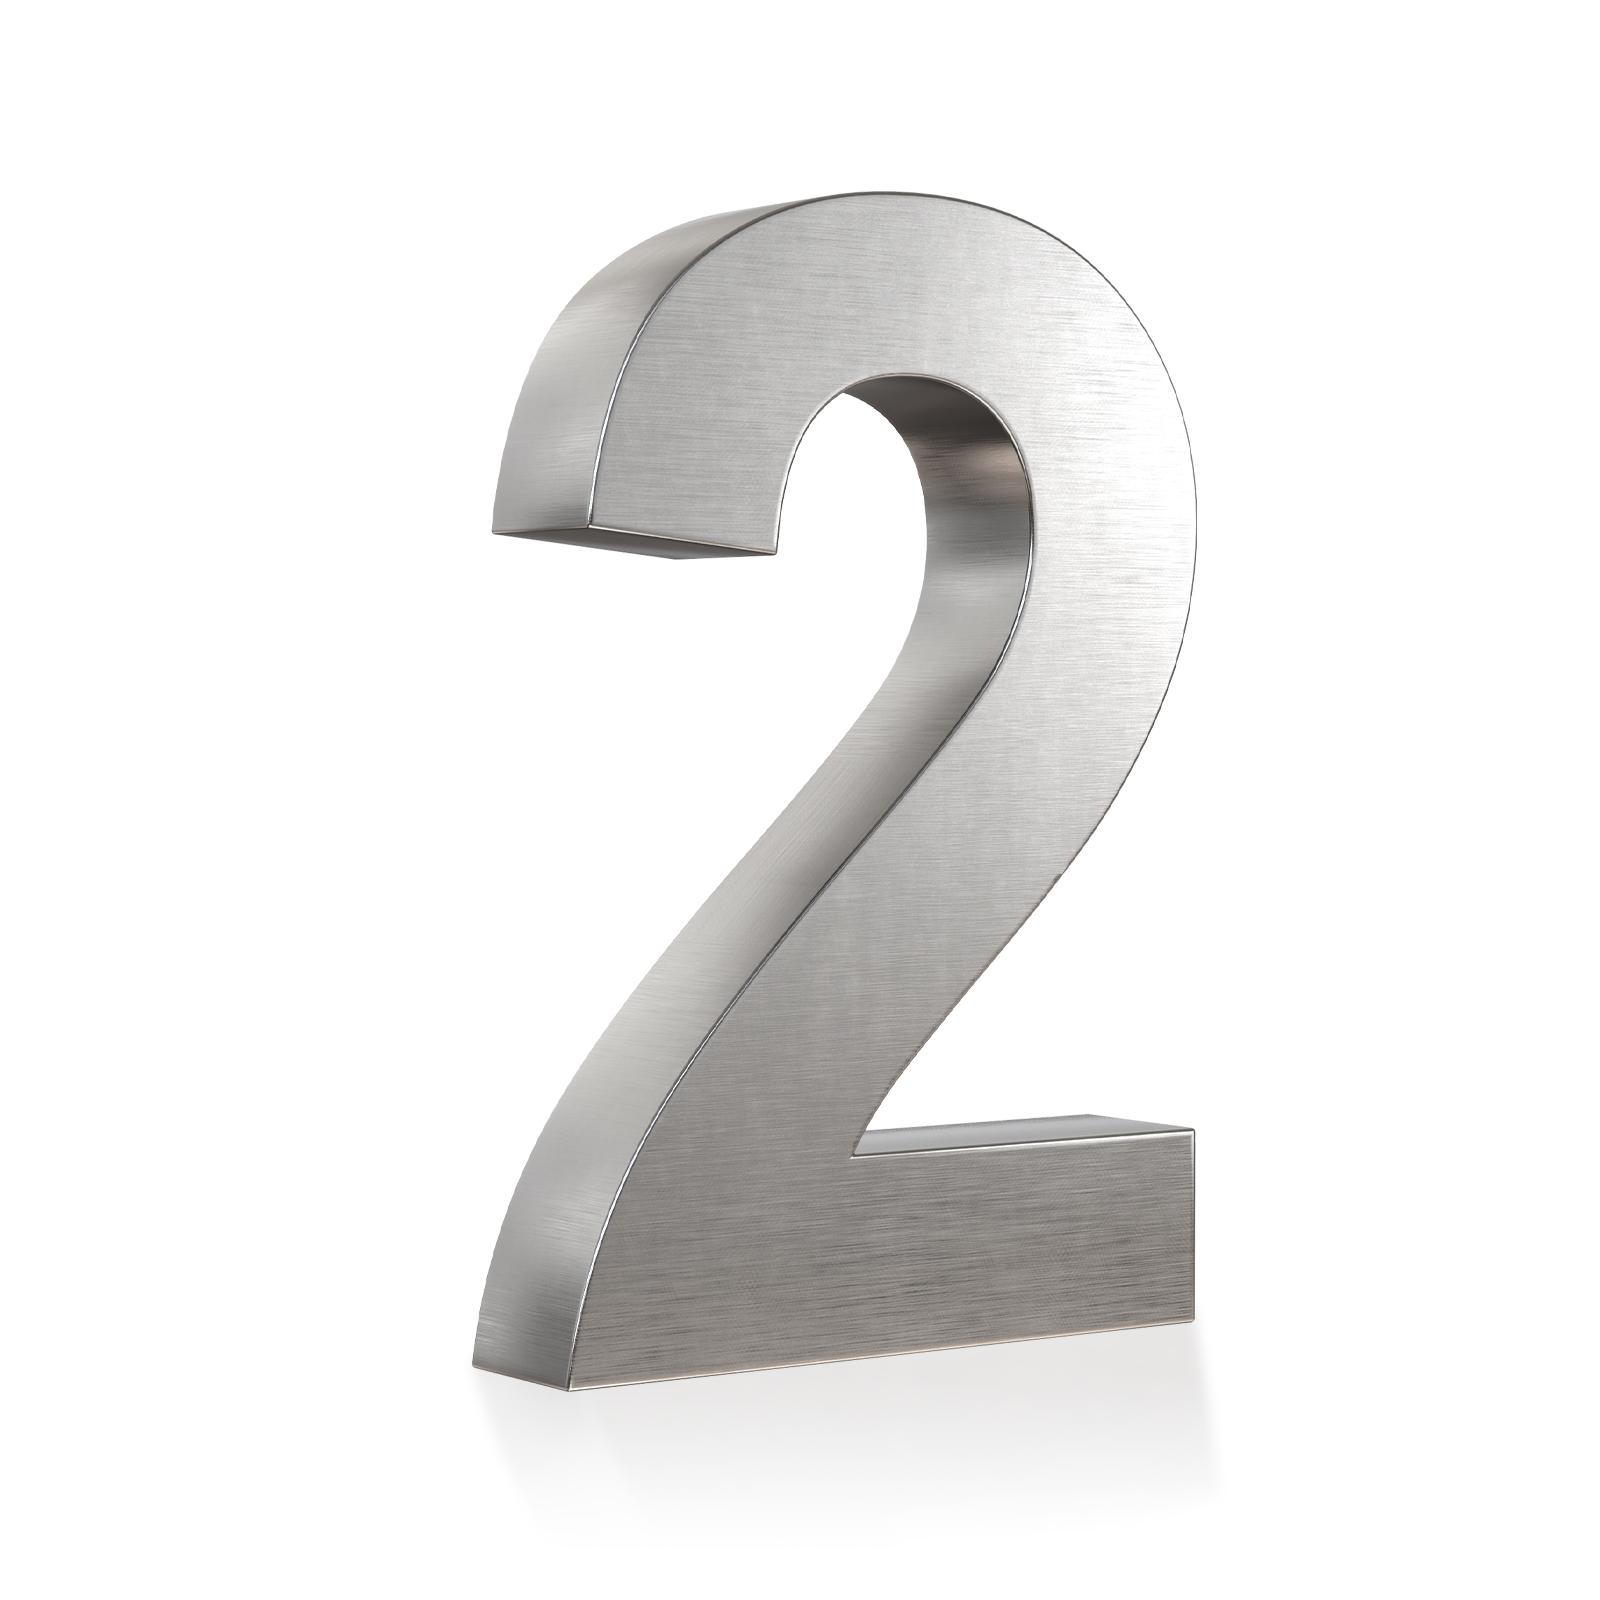 3D Hausnummer 2 Edelstahl in 3D Design Arial V2A